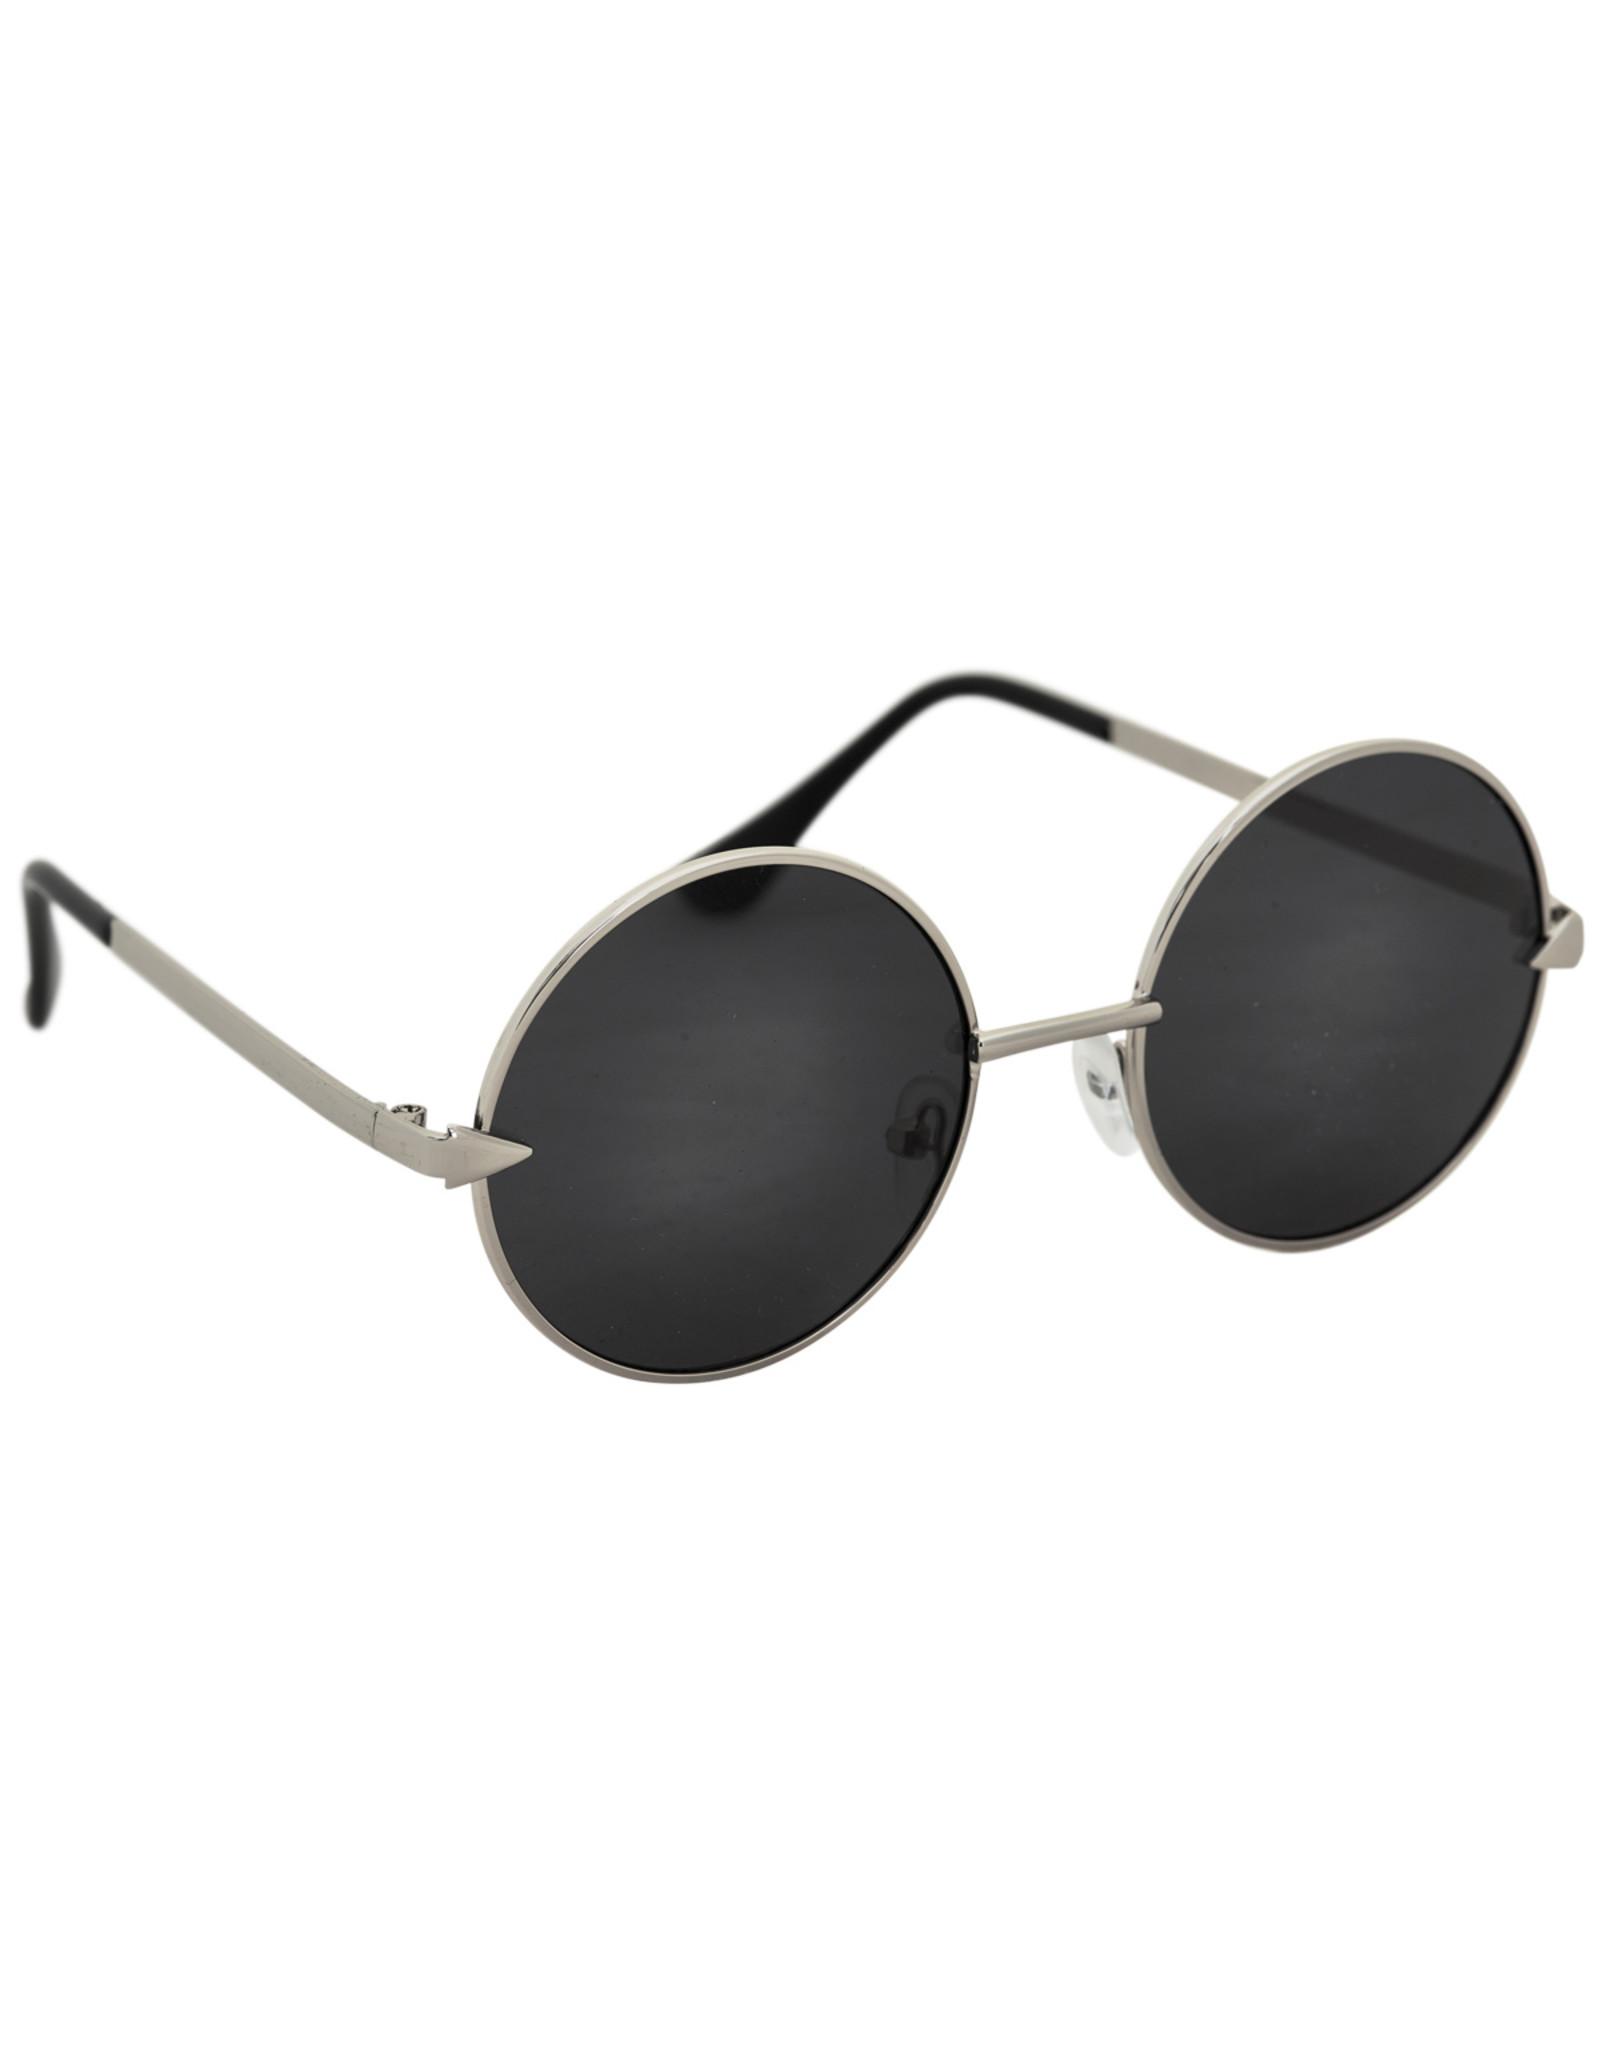 Creamie Creamie Sunglasses Black